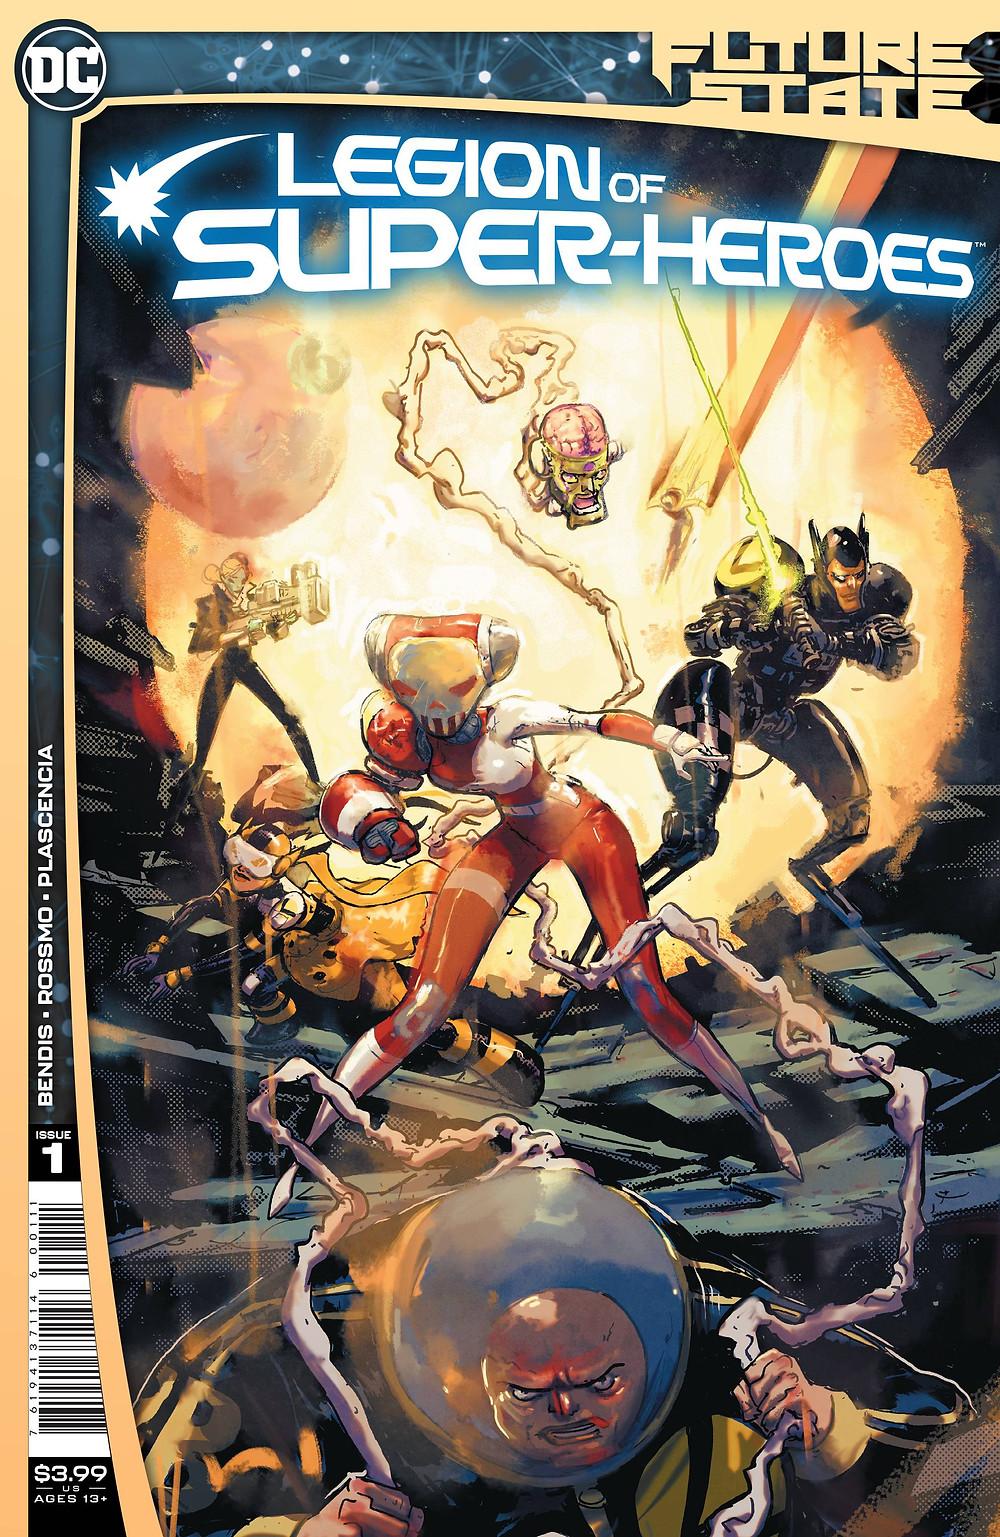 FUTURE STATE: LEGION OF SUPERHEROES #1 COVER